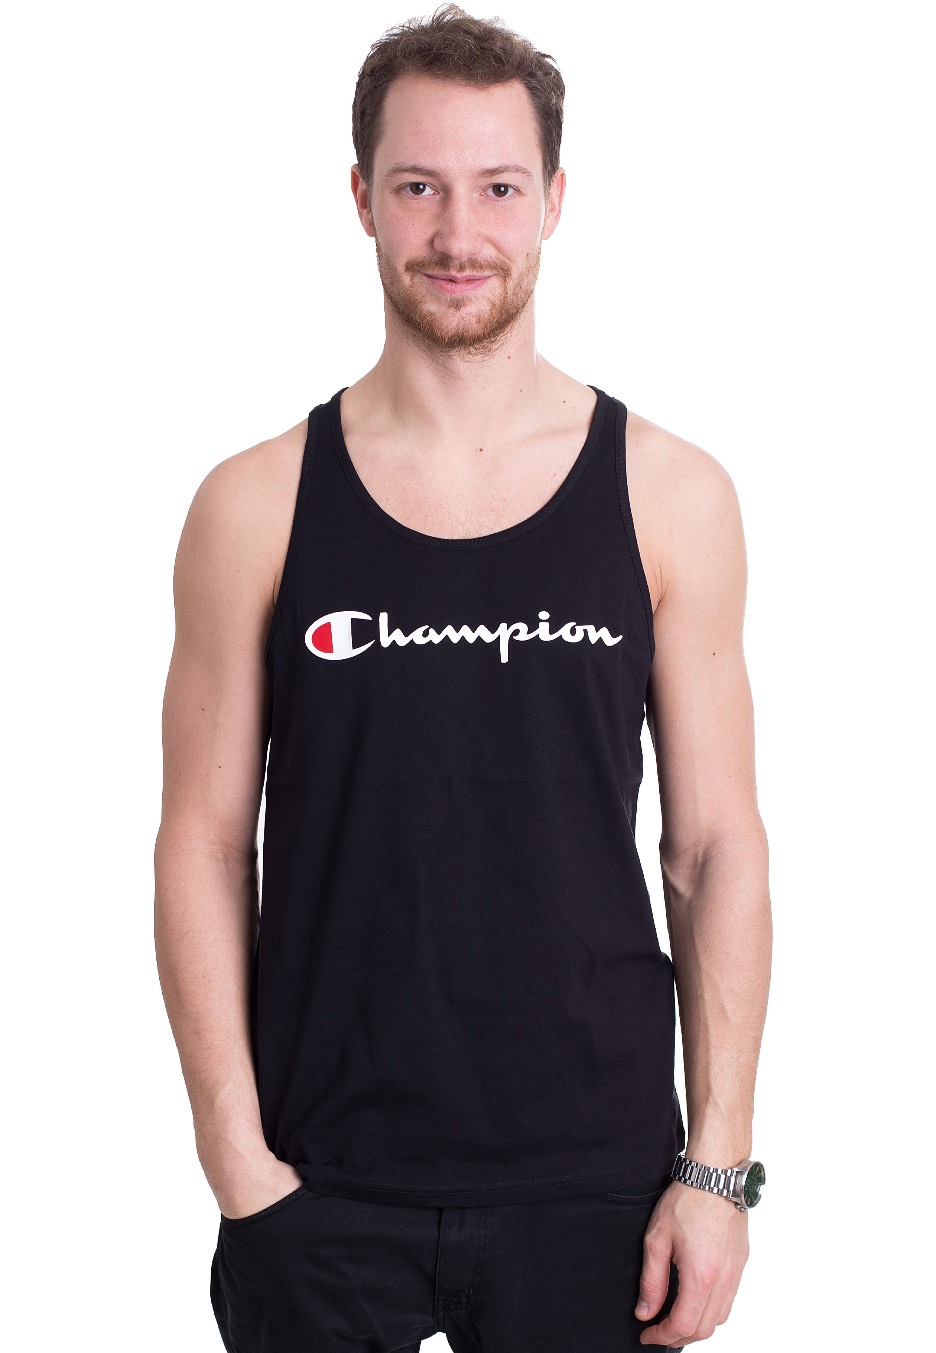 18b38161aba5 Champion - Tank Top New Black - Tank - Streetwear Shop - Impericon.com UK